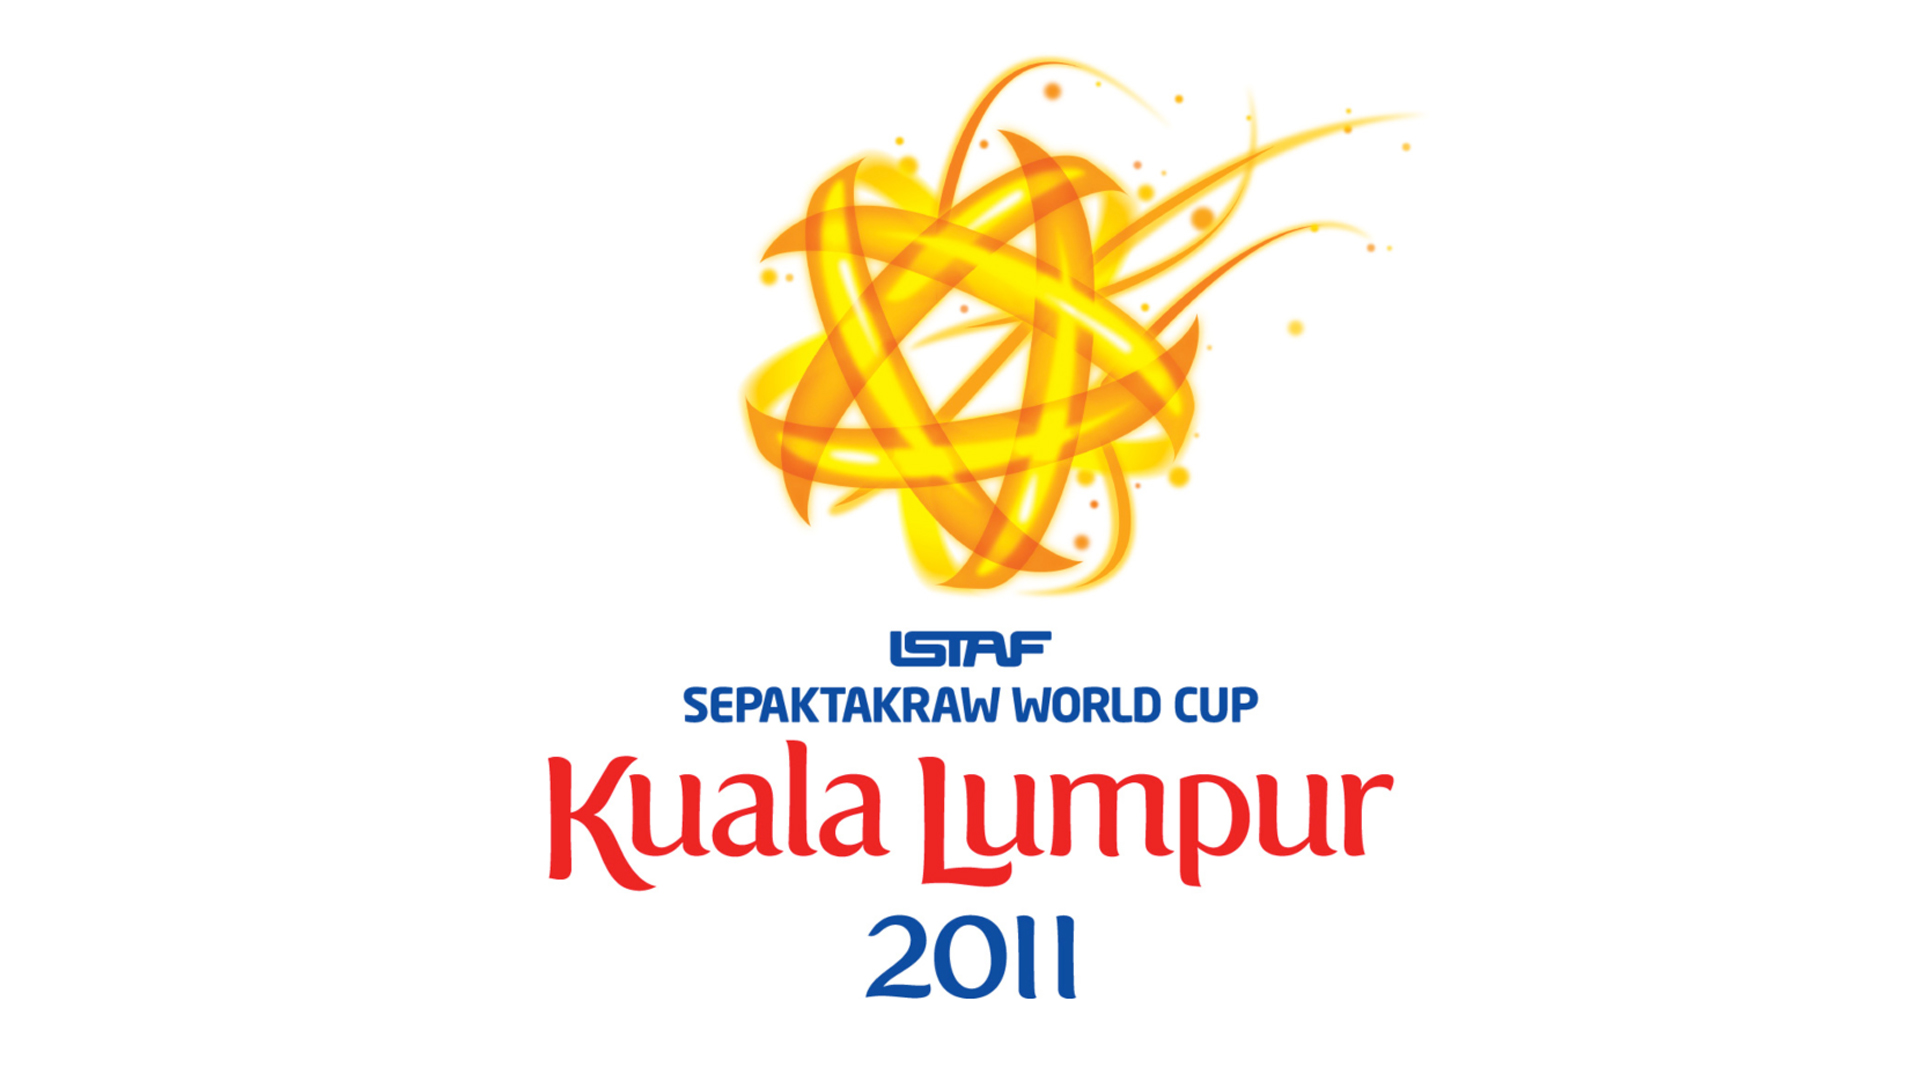 ISTAF SEPAKTAKRAW WORLD CUP